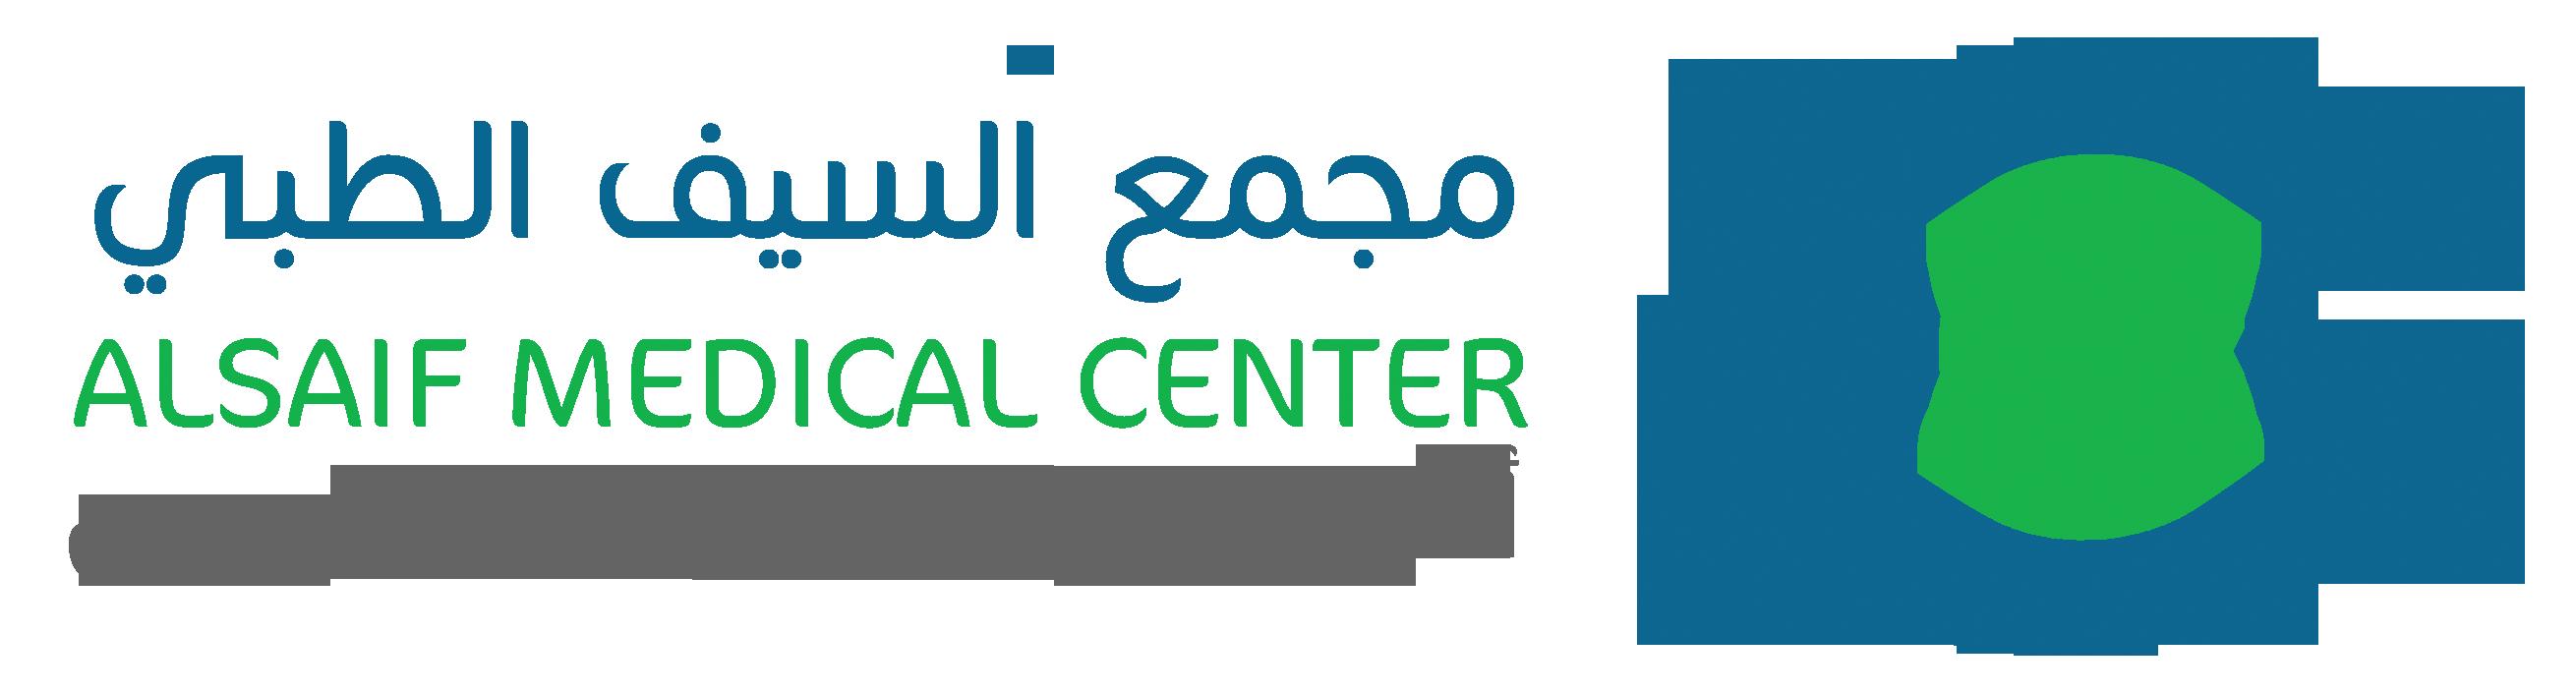 Alsaif Medical Center Logo